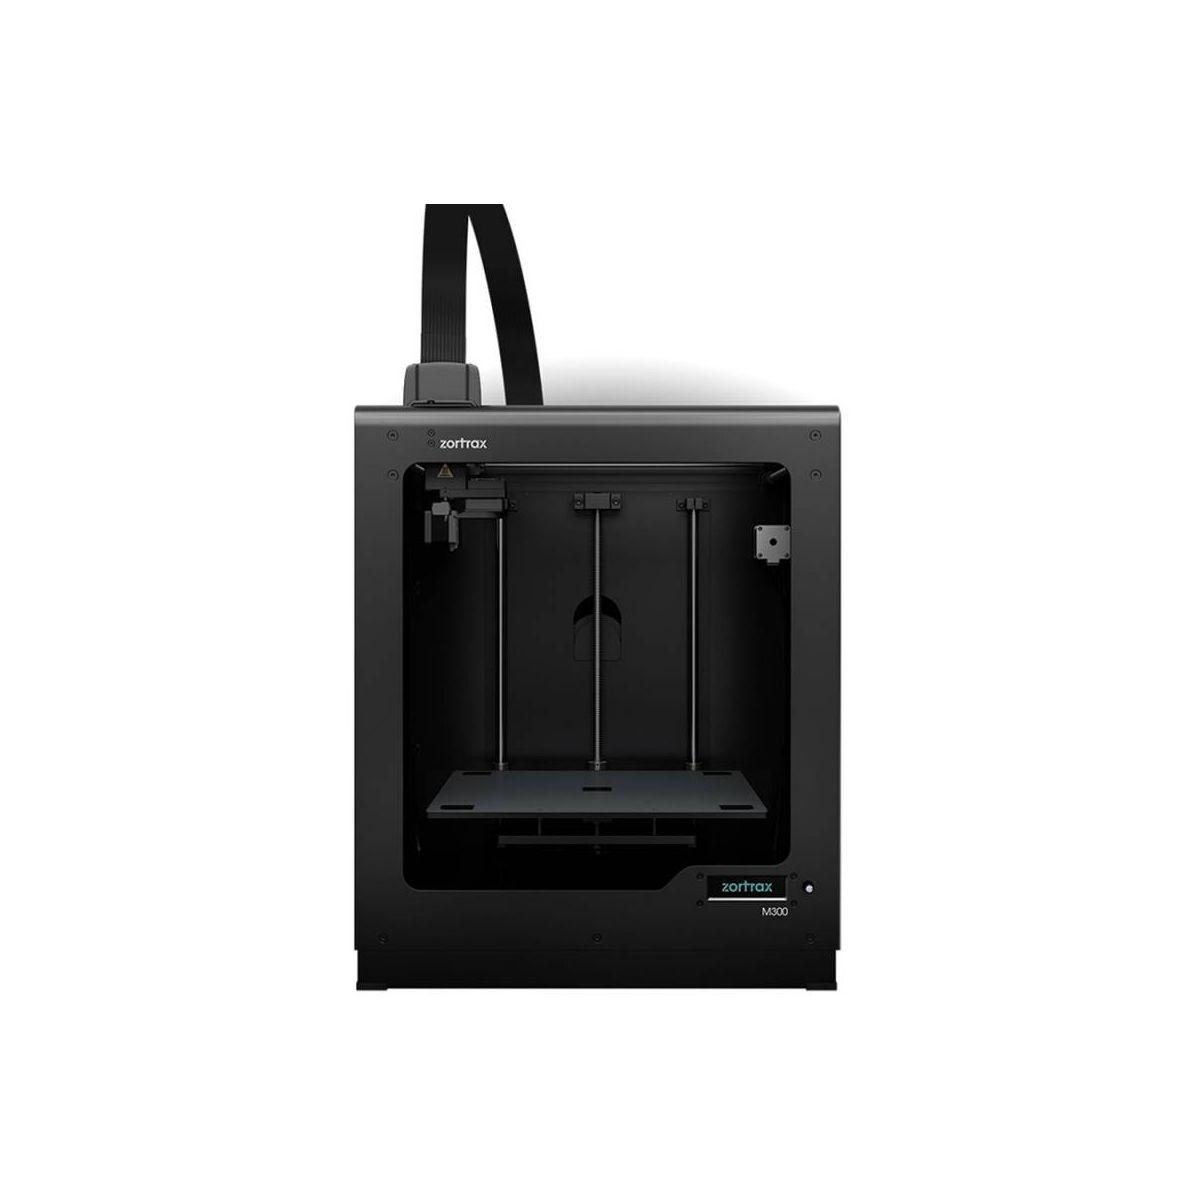 Imprimante 3D ZORTRAX M300 (photo)